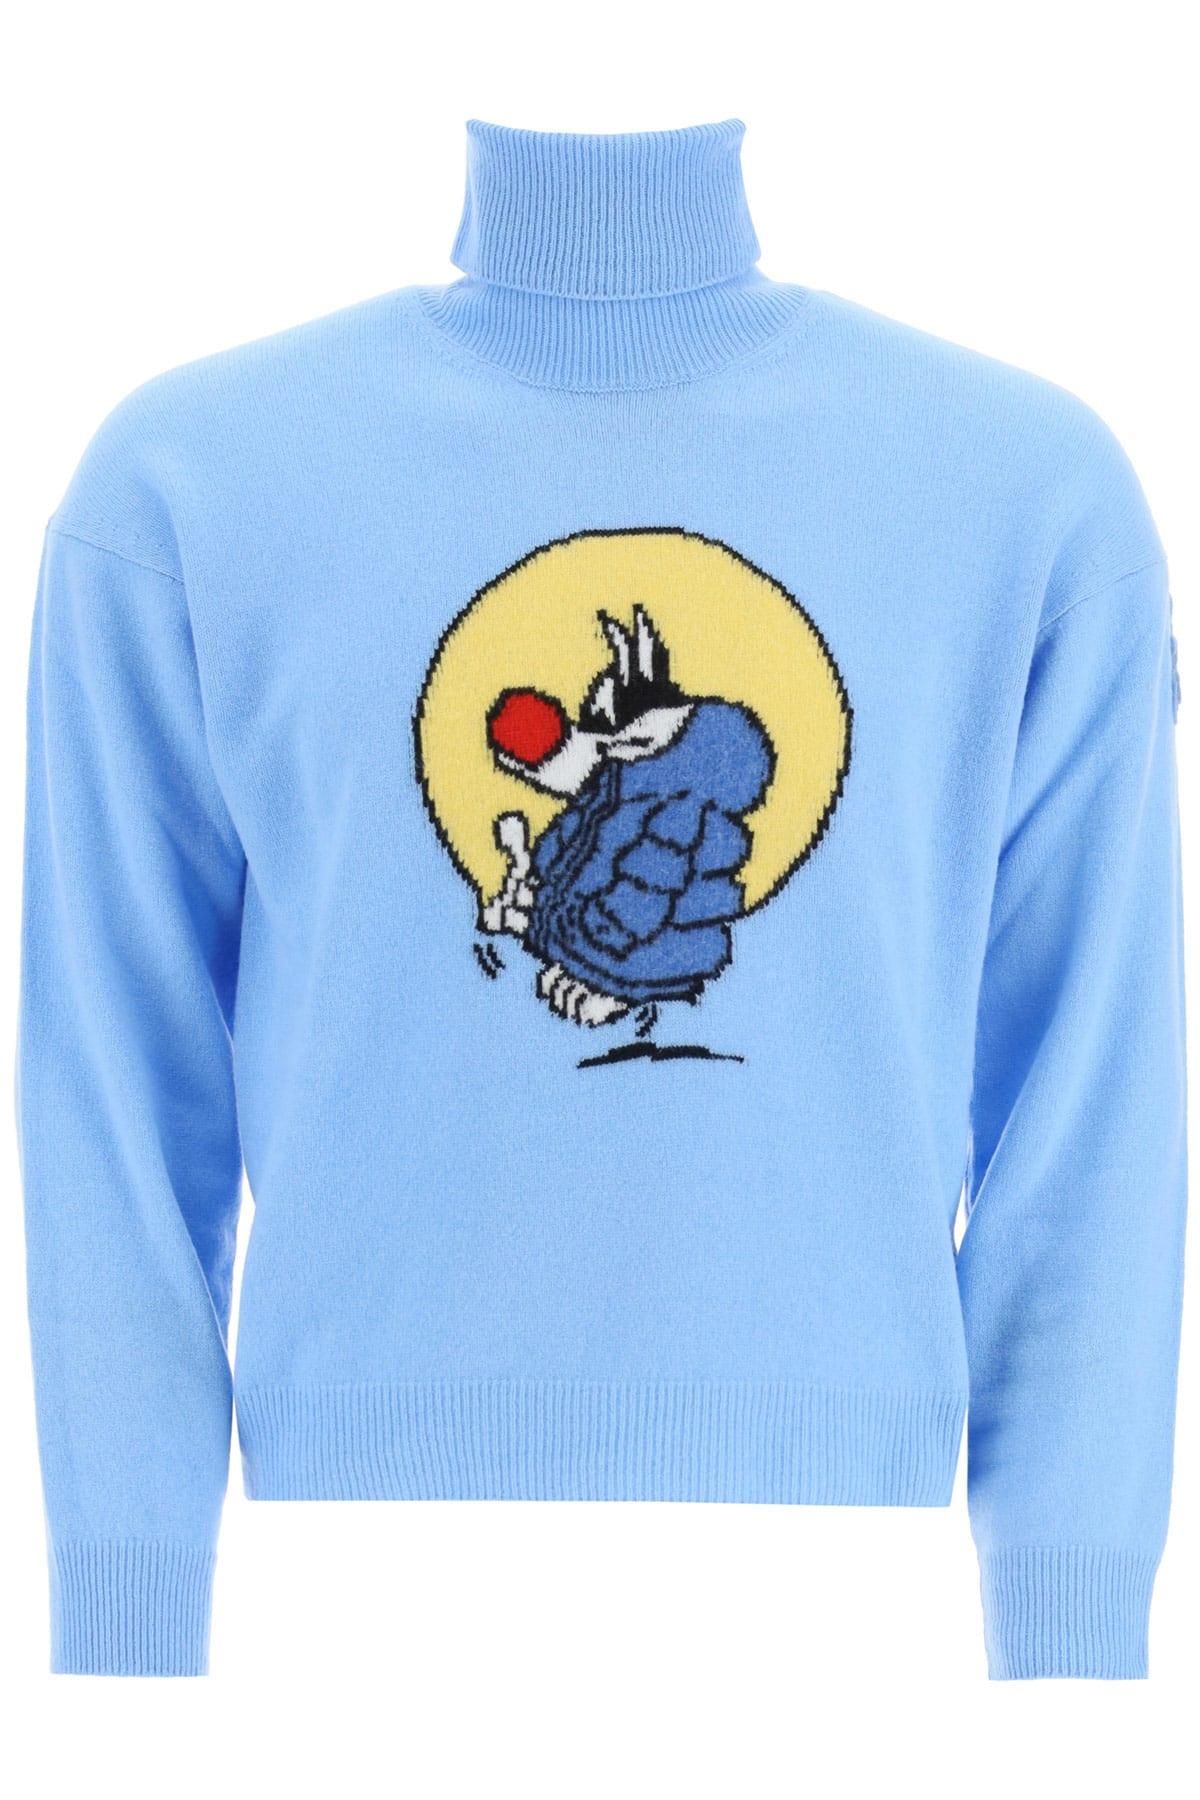 Moncler Genius 1 Sylvester Turtleneck Sweater In Light Blue (light Blue)